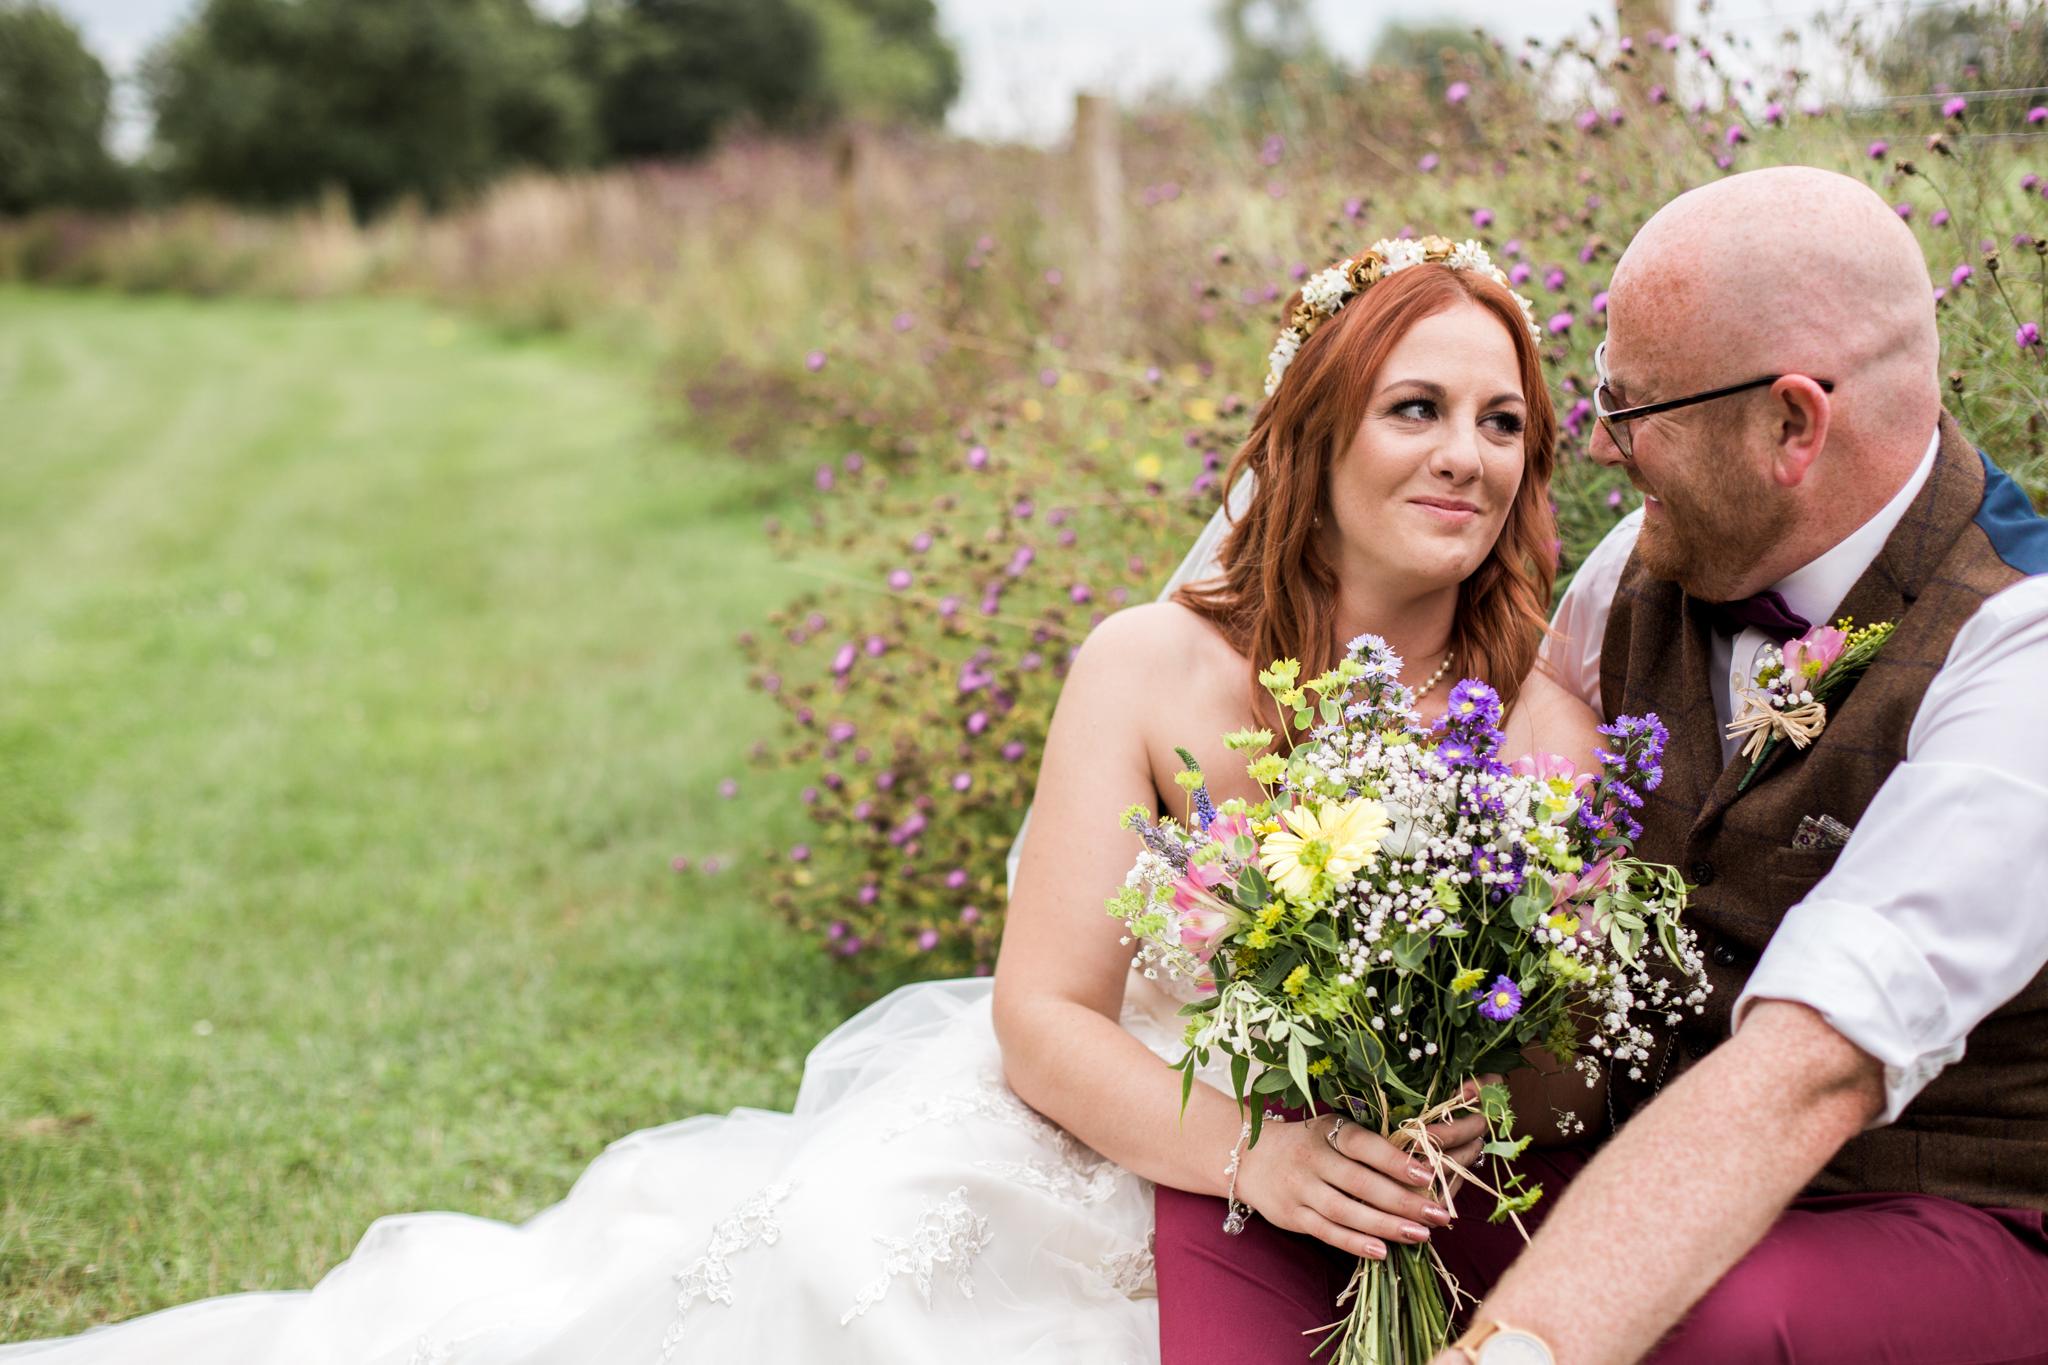 Rowsie & Lee, Swallows Nest Barn Wedding, Cotswold wedding photographer, Warwickshire Wedding Photographer-83.jpg